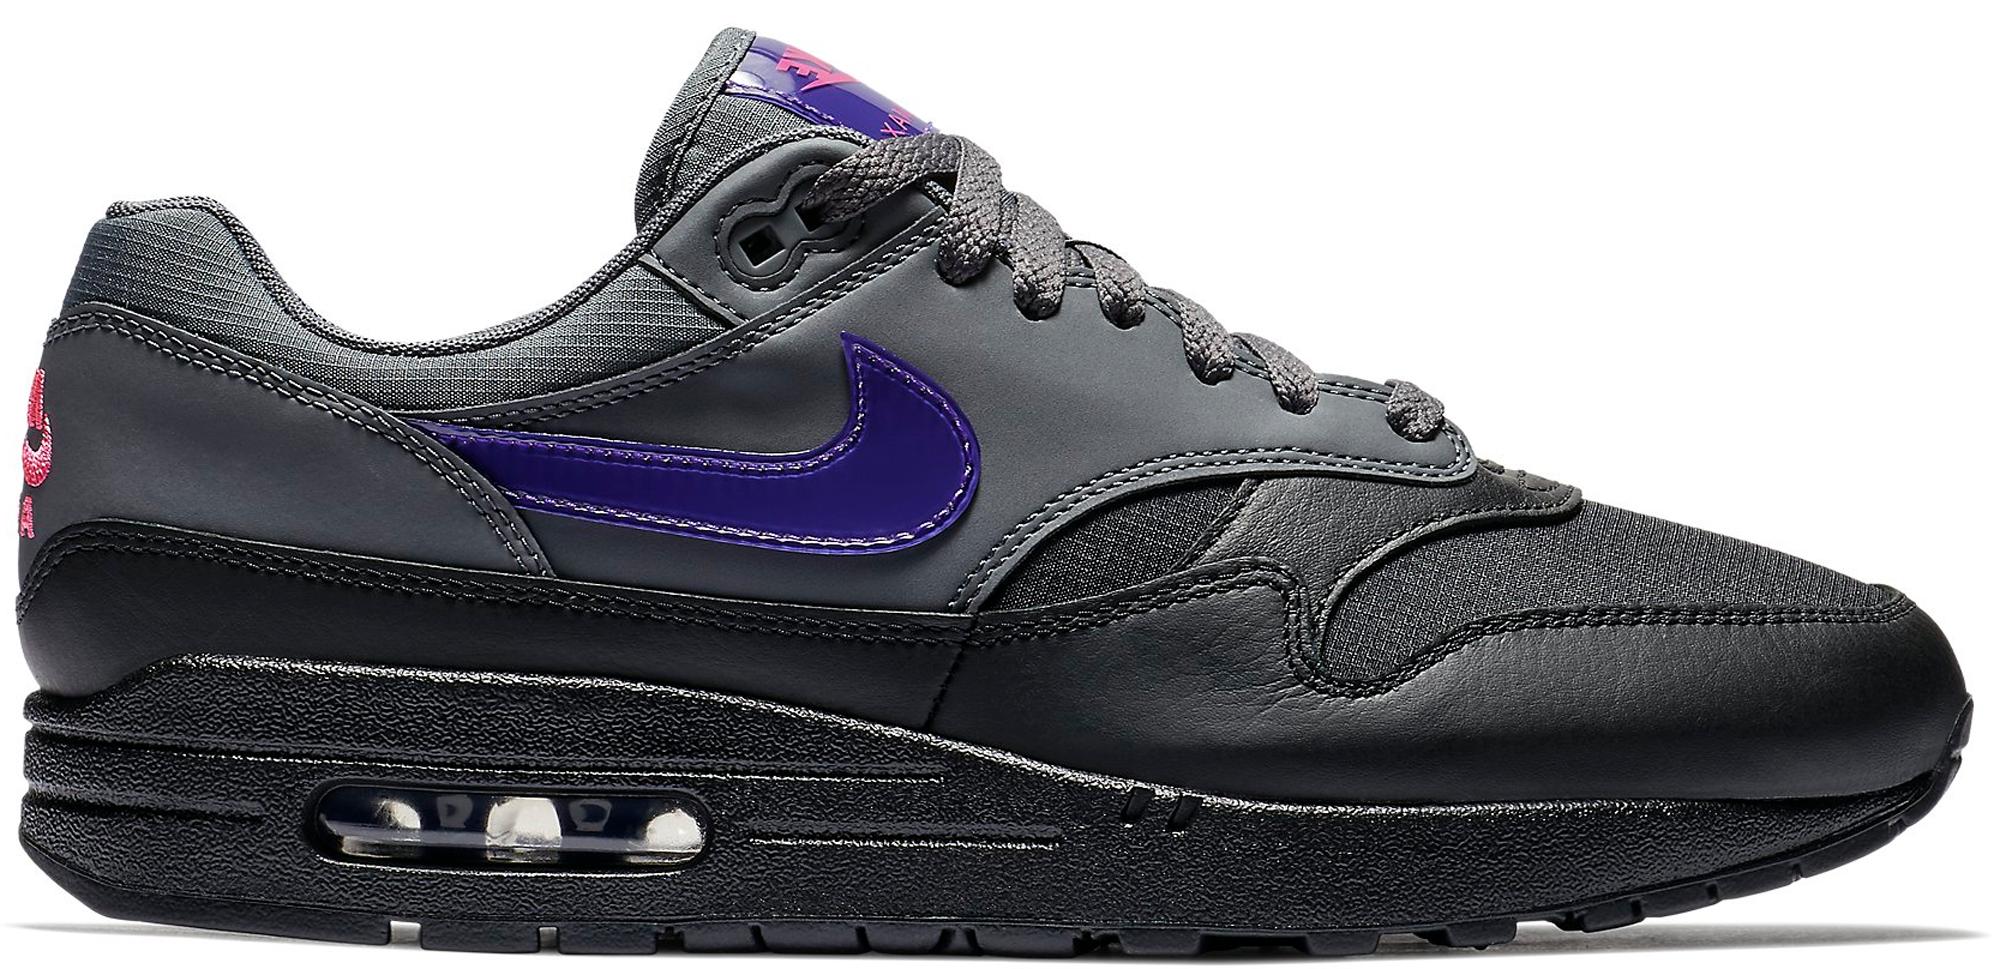 nike air max grey purple